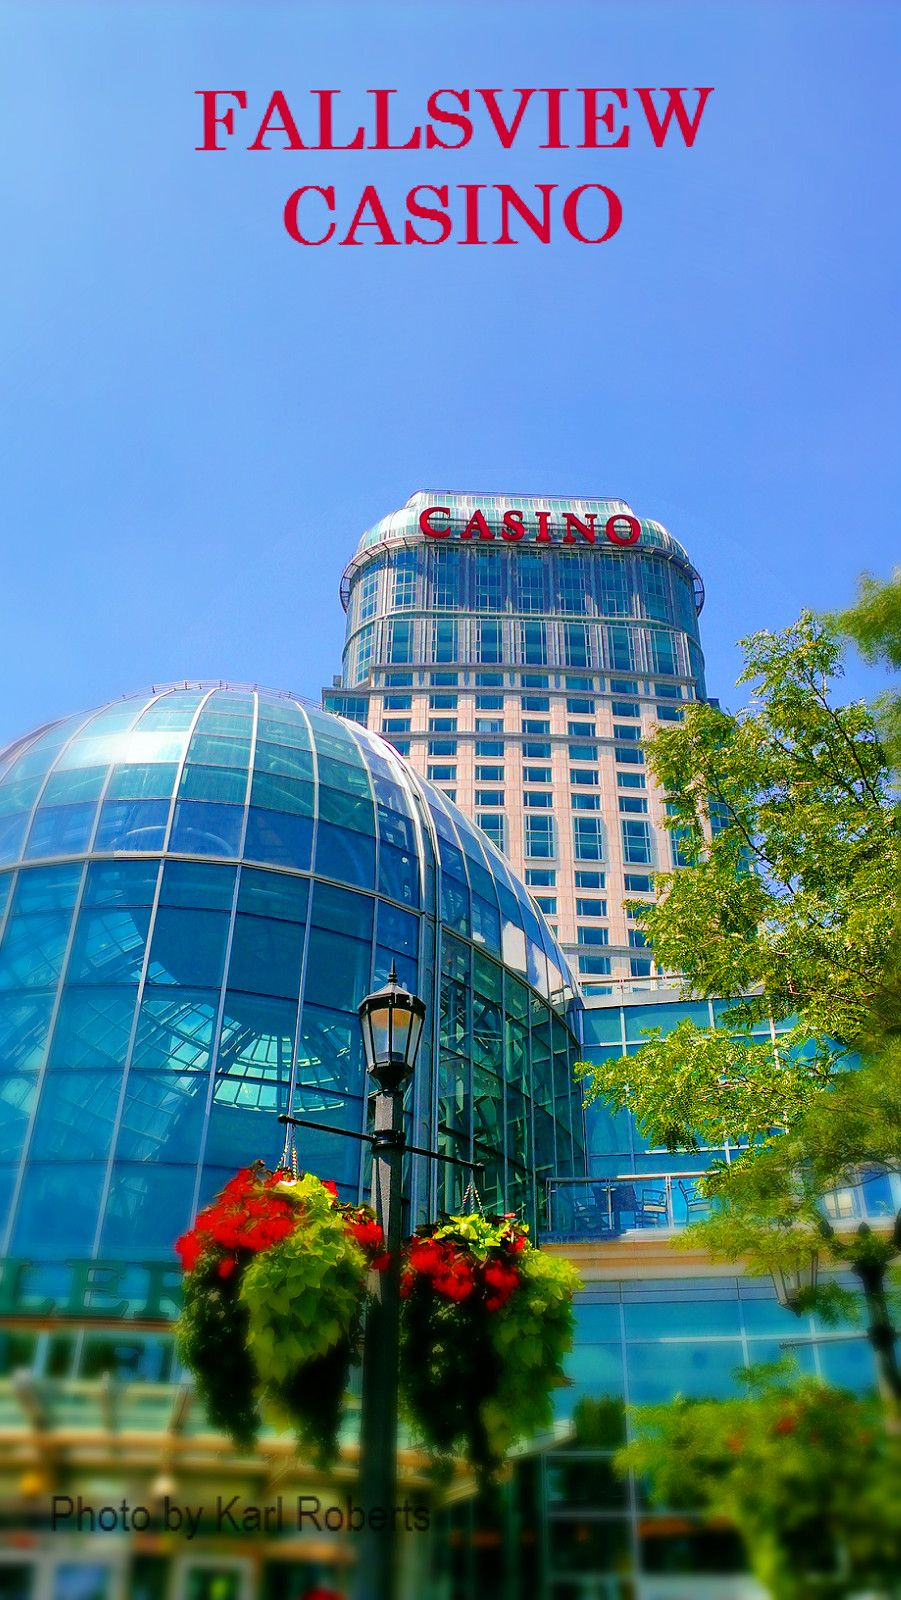 Fallsview Casino Job Openings